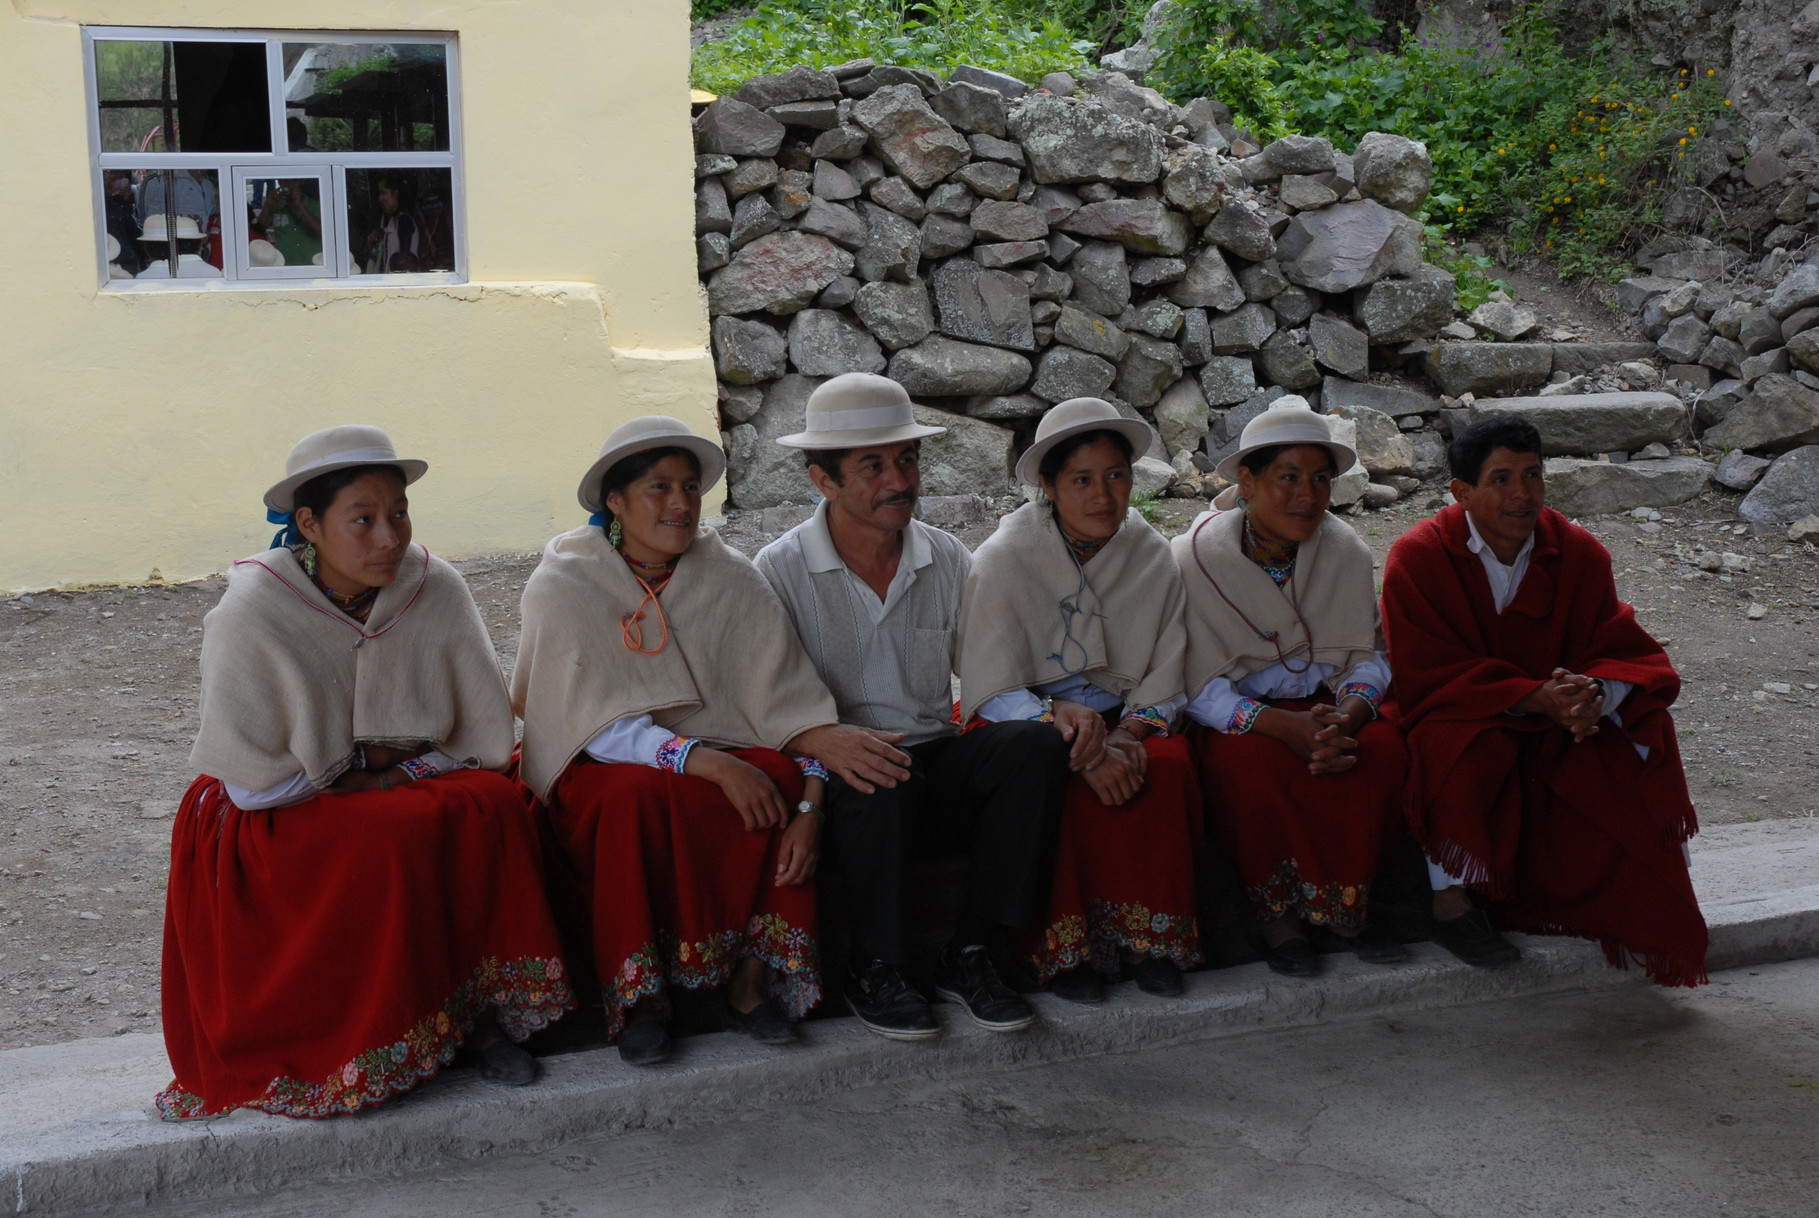 Die Folkloregruppe